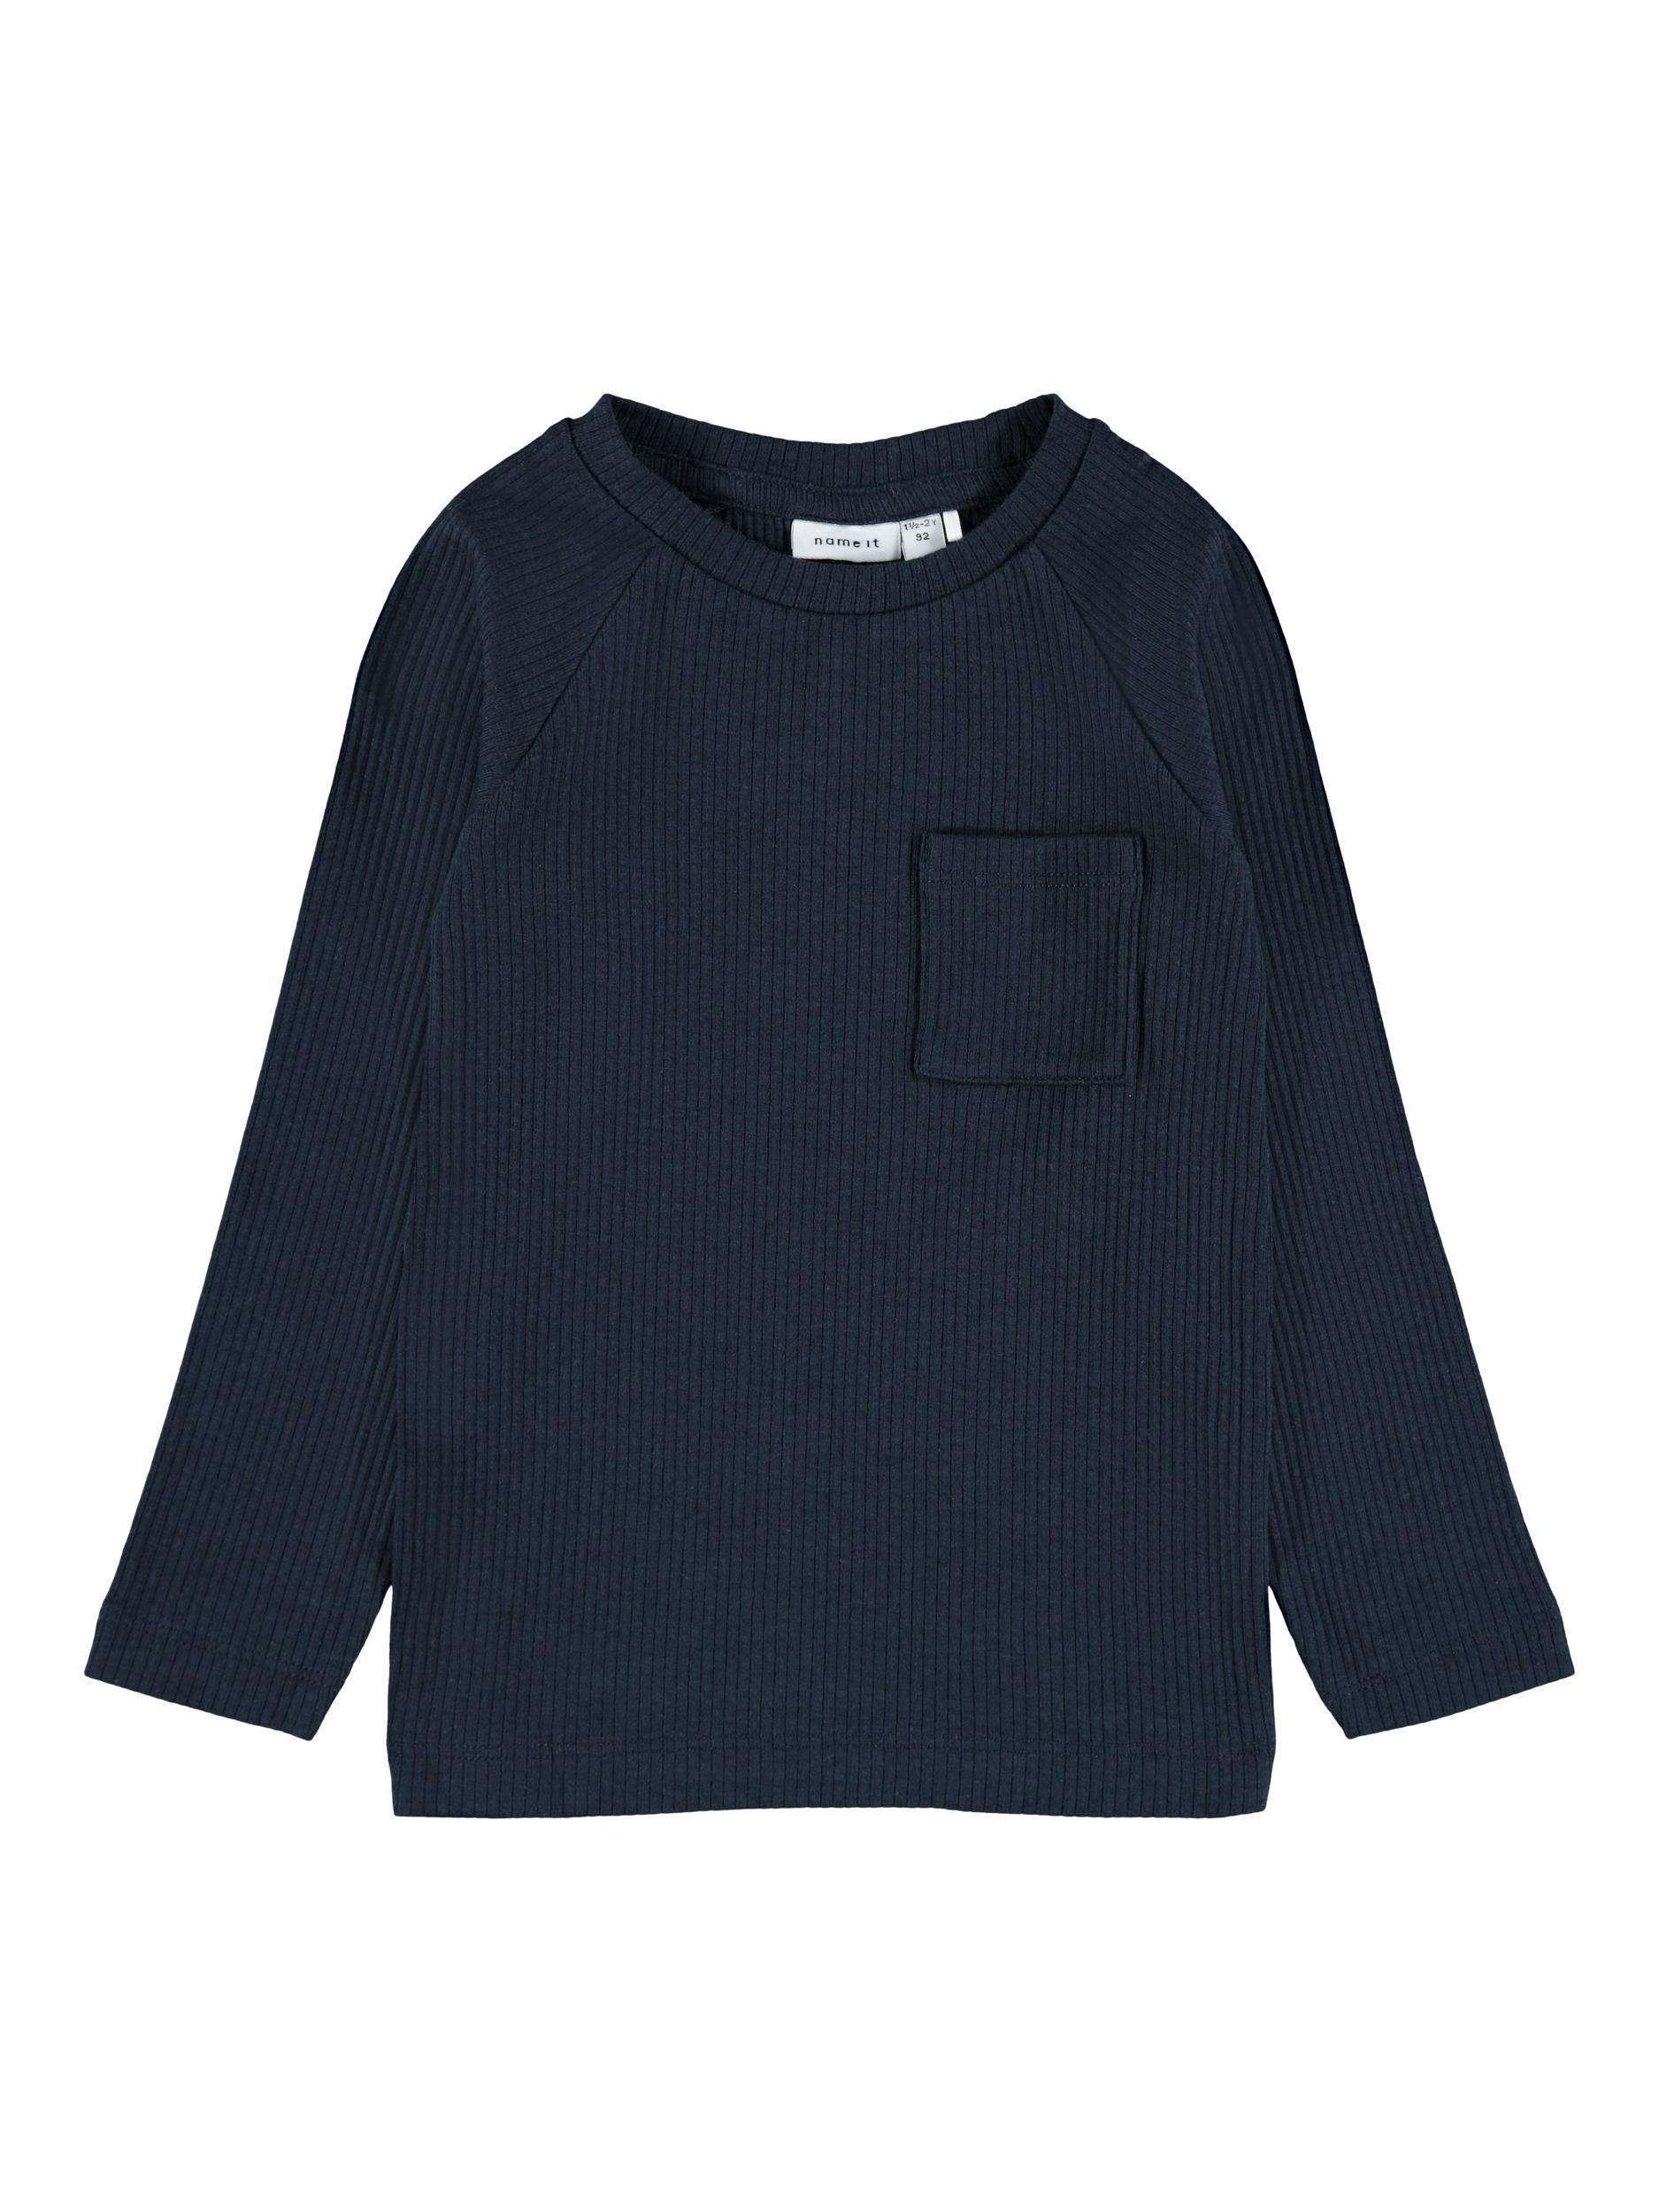 Name It Kabilleon LS t-shirt, dark sapphire, 86